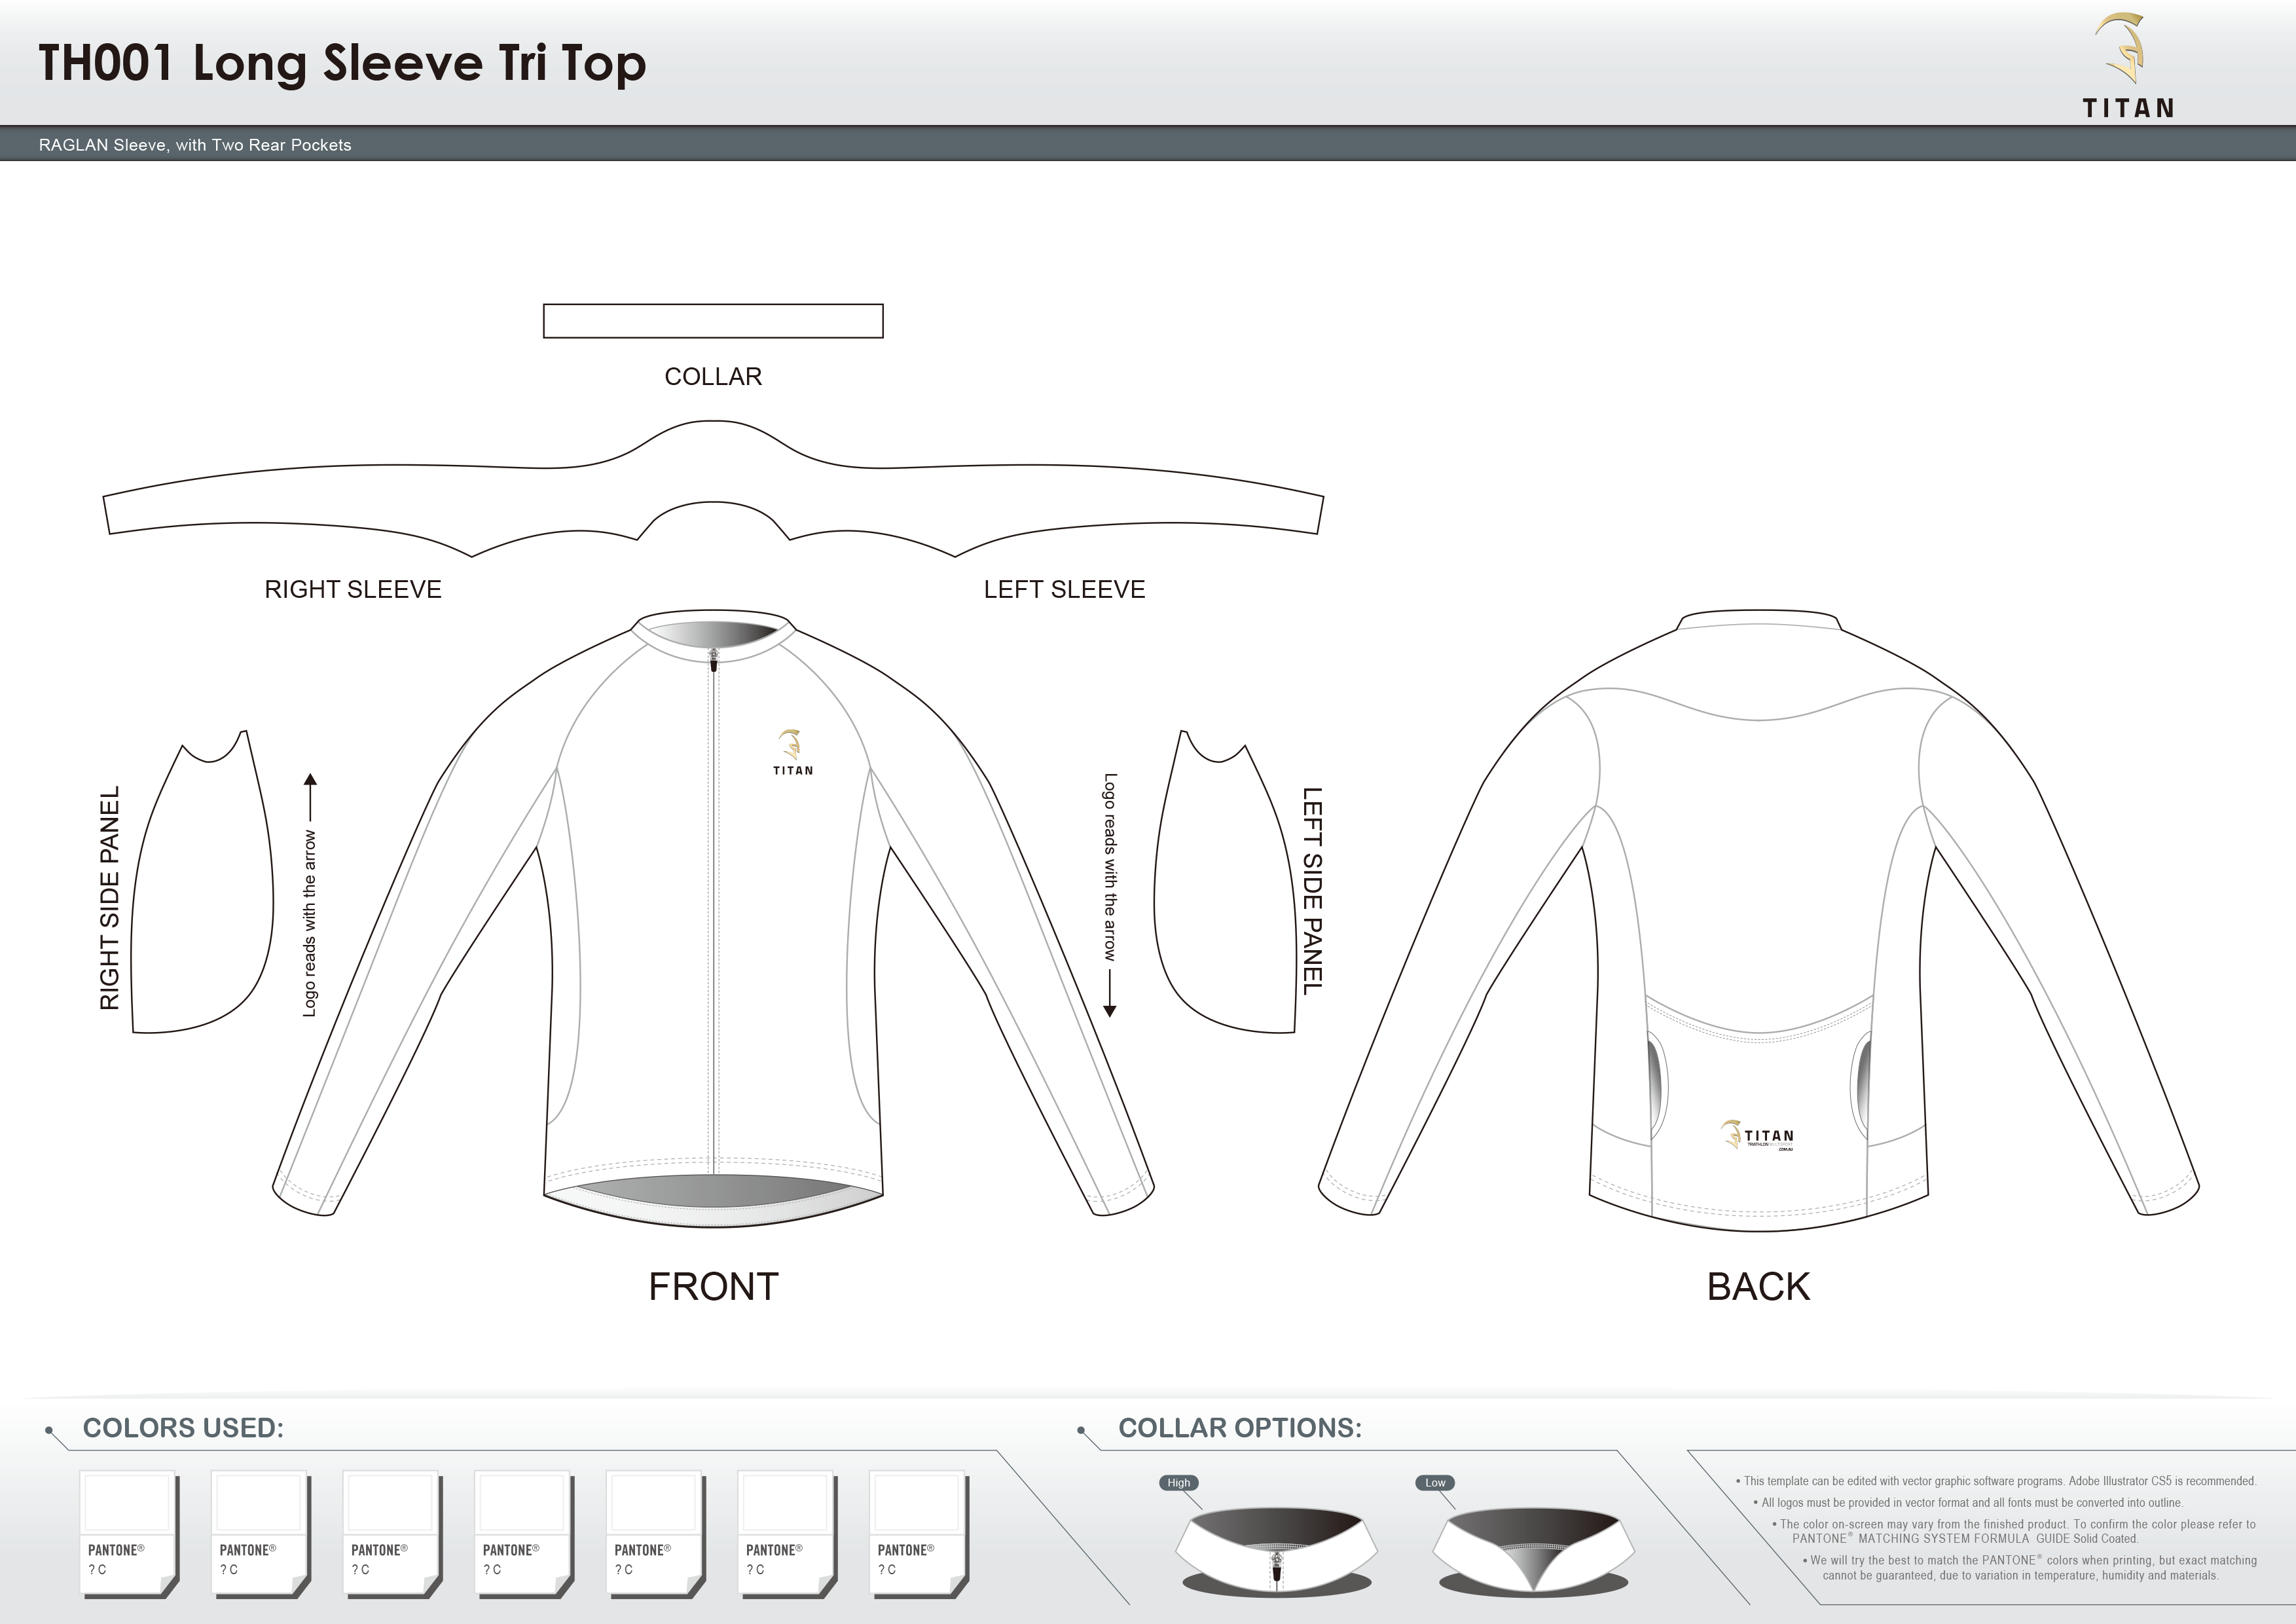 TH001 Long Sleeve Tri Top